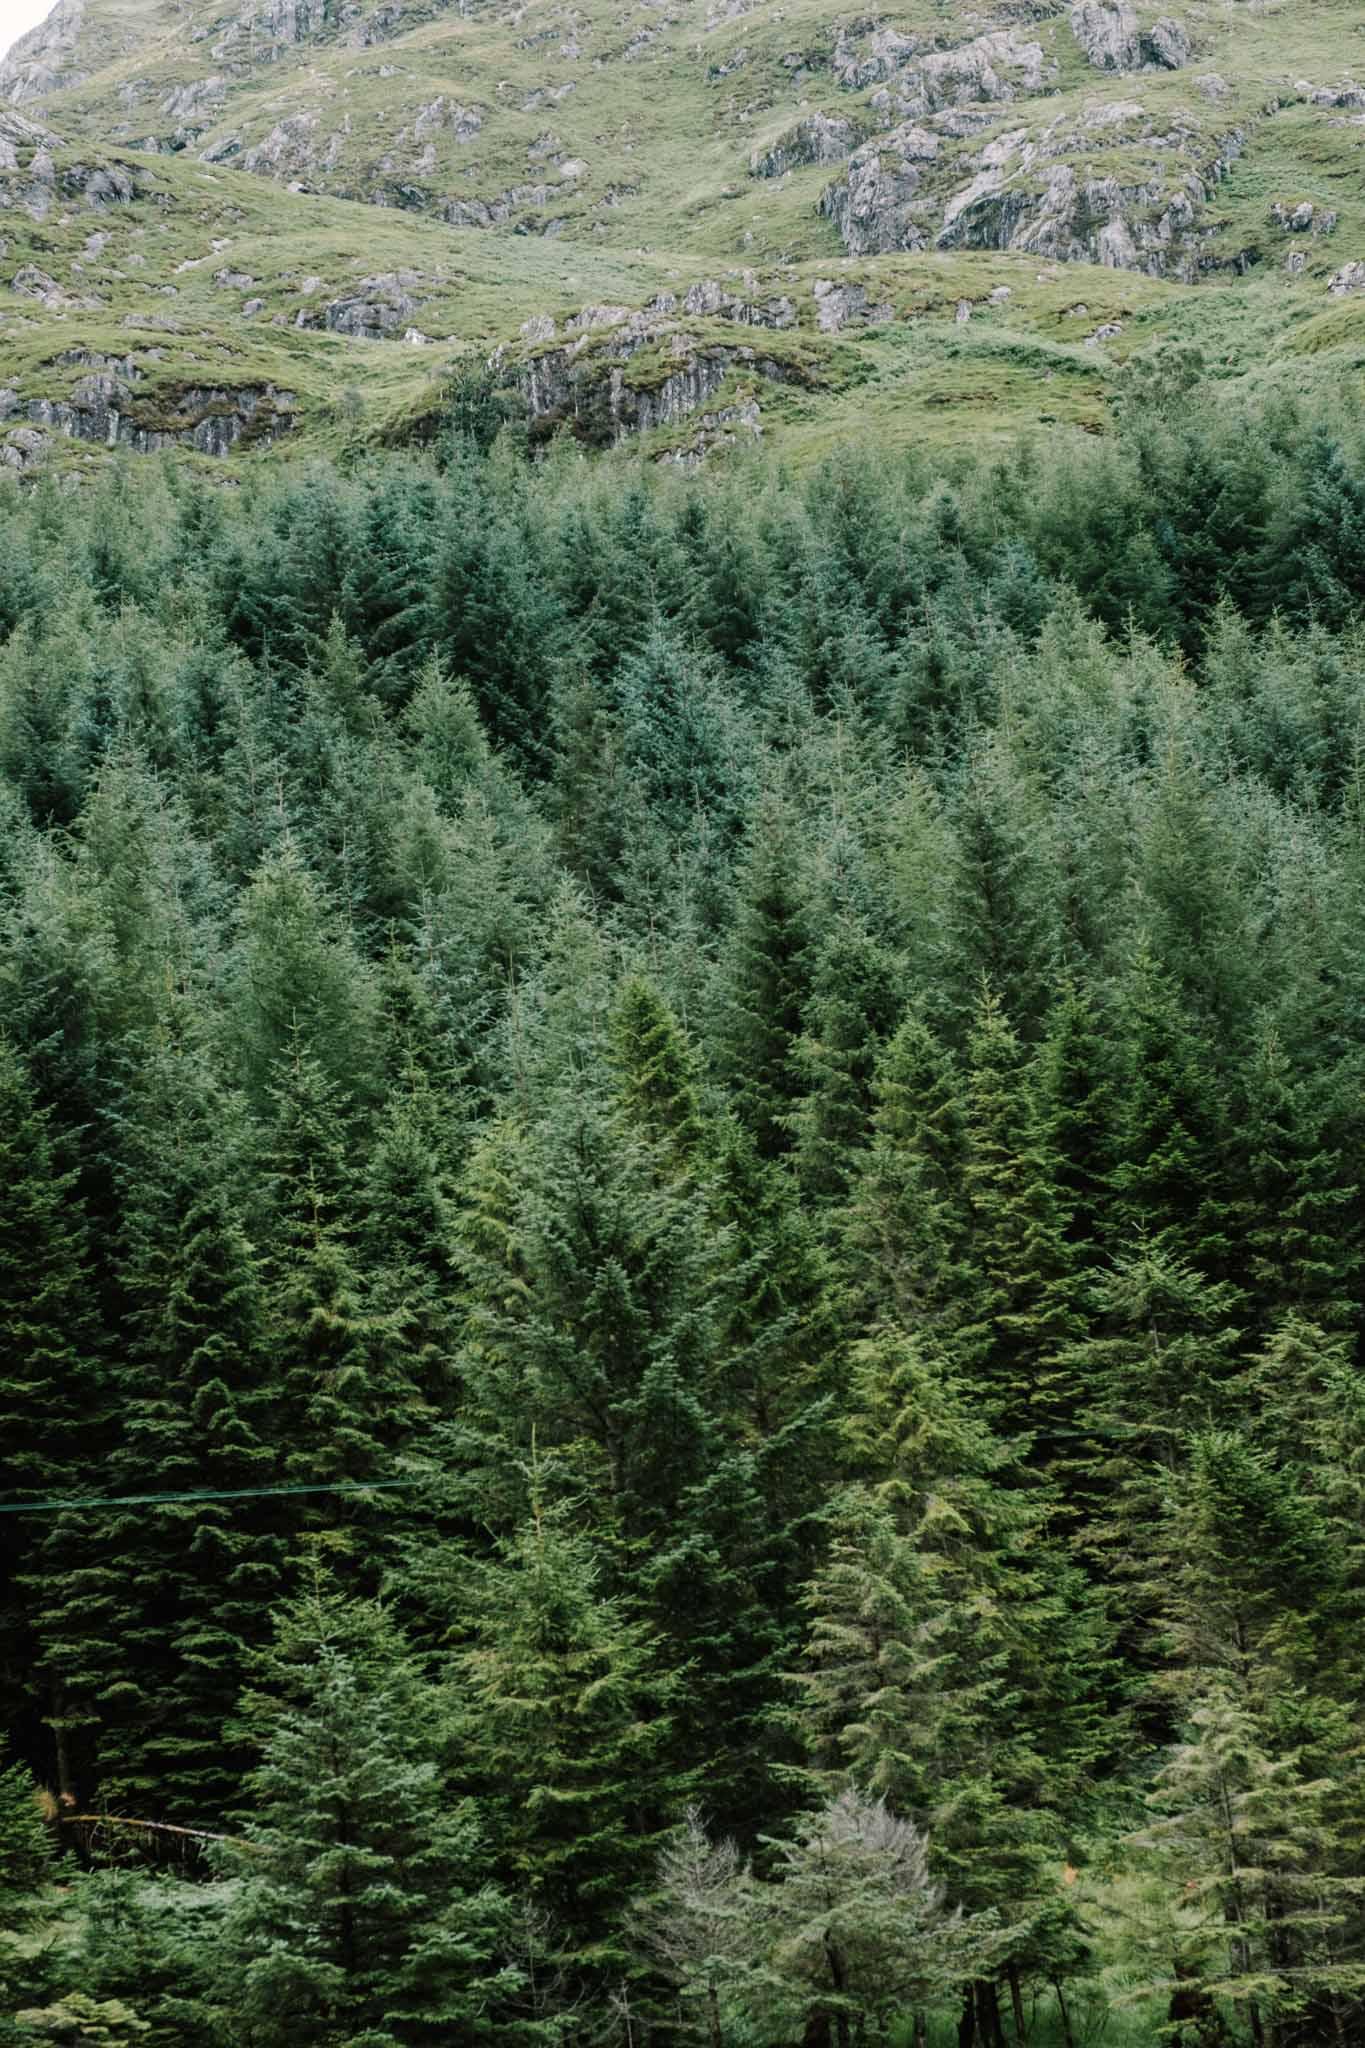 Highland Explorer Tours-160725-151029.jpg